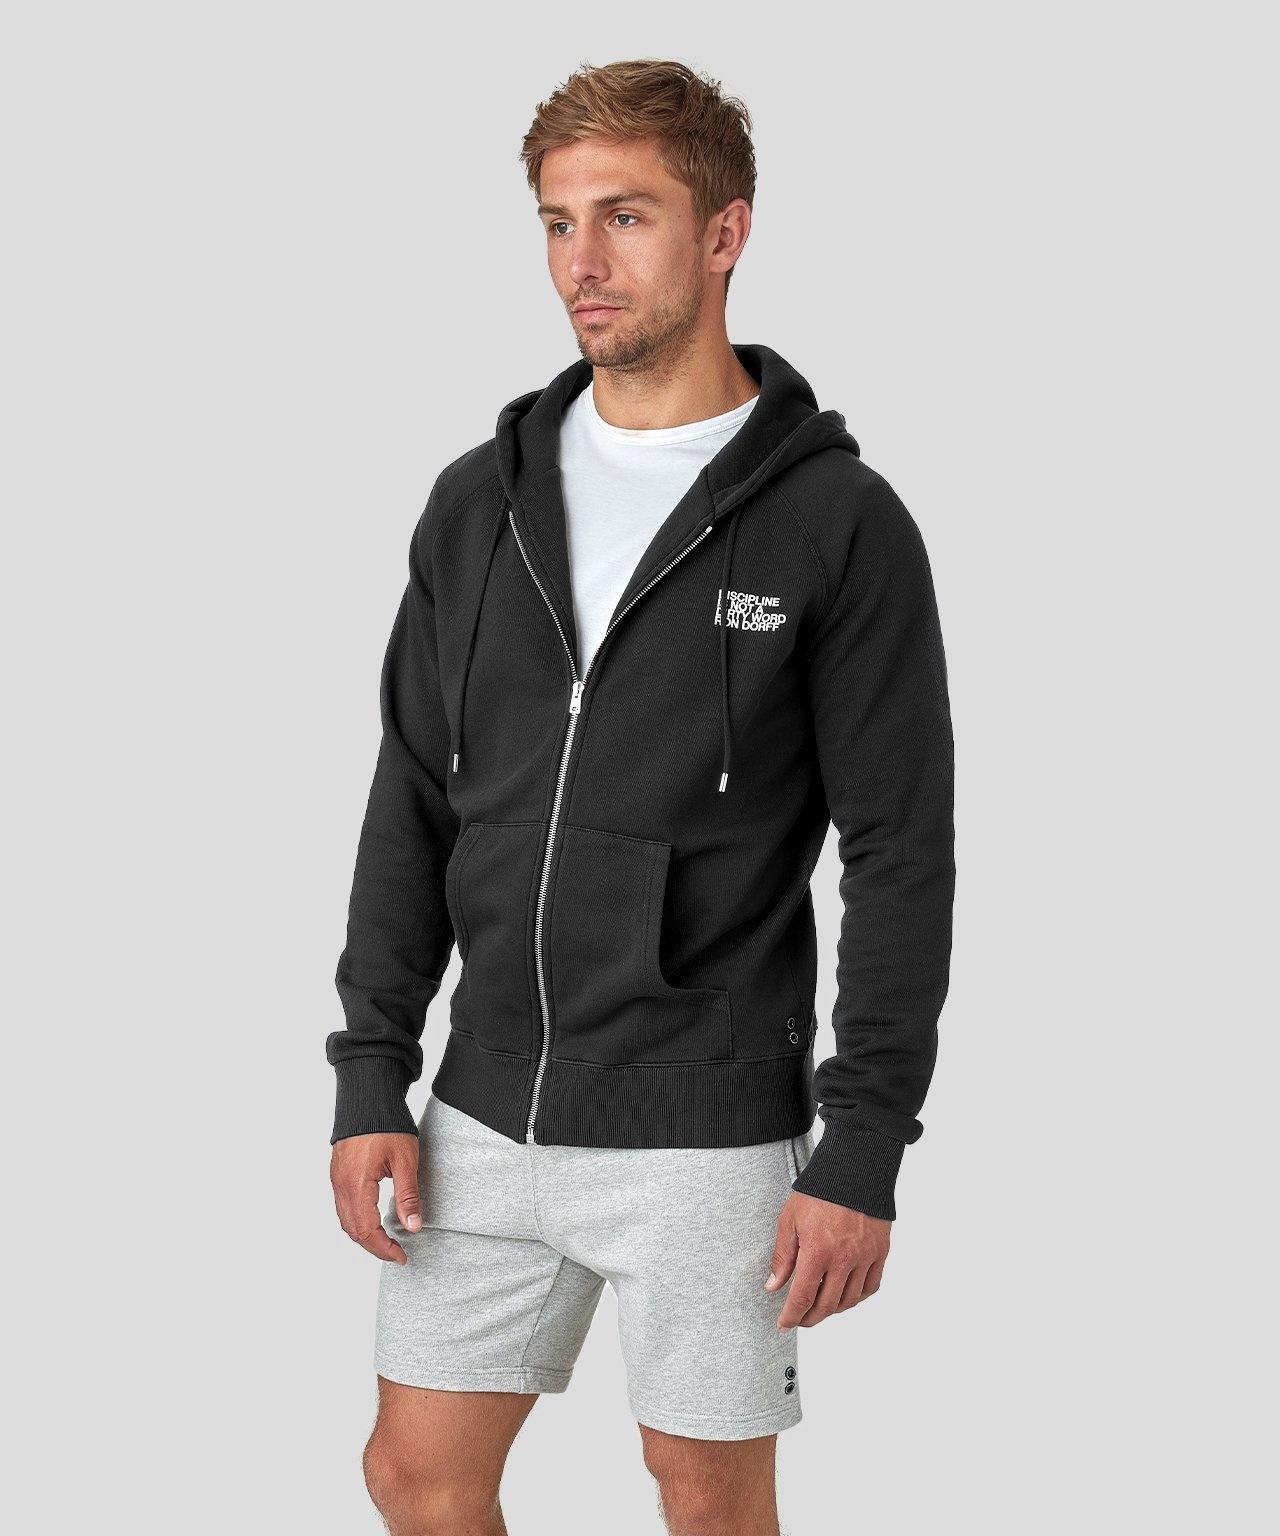 Ron Dorff DISCIPLINE smll prnt zipped hoody Black